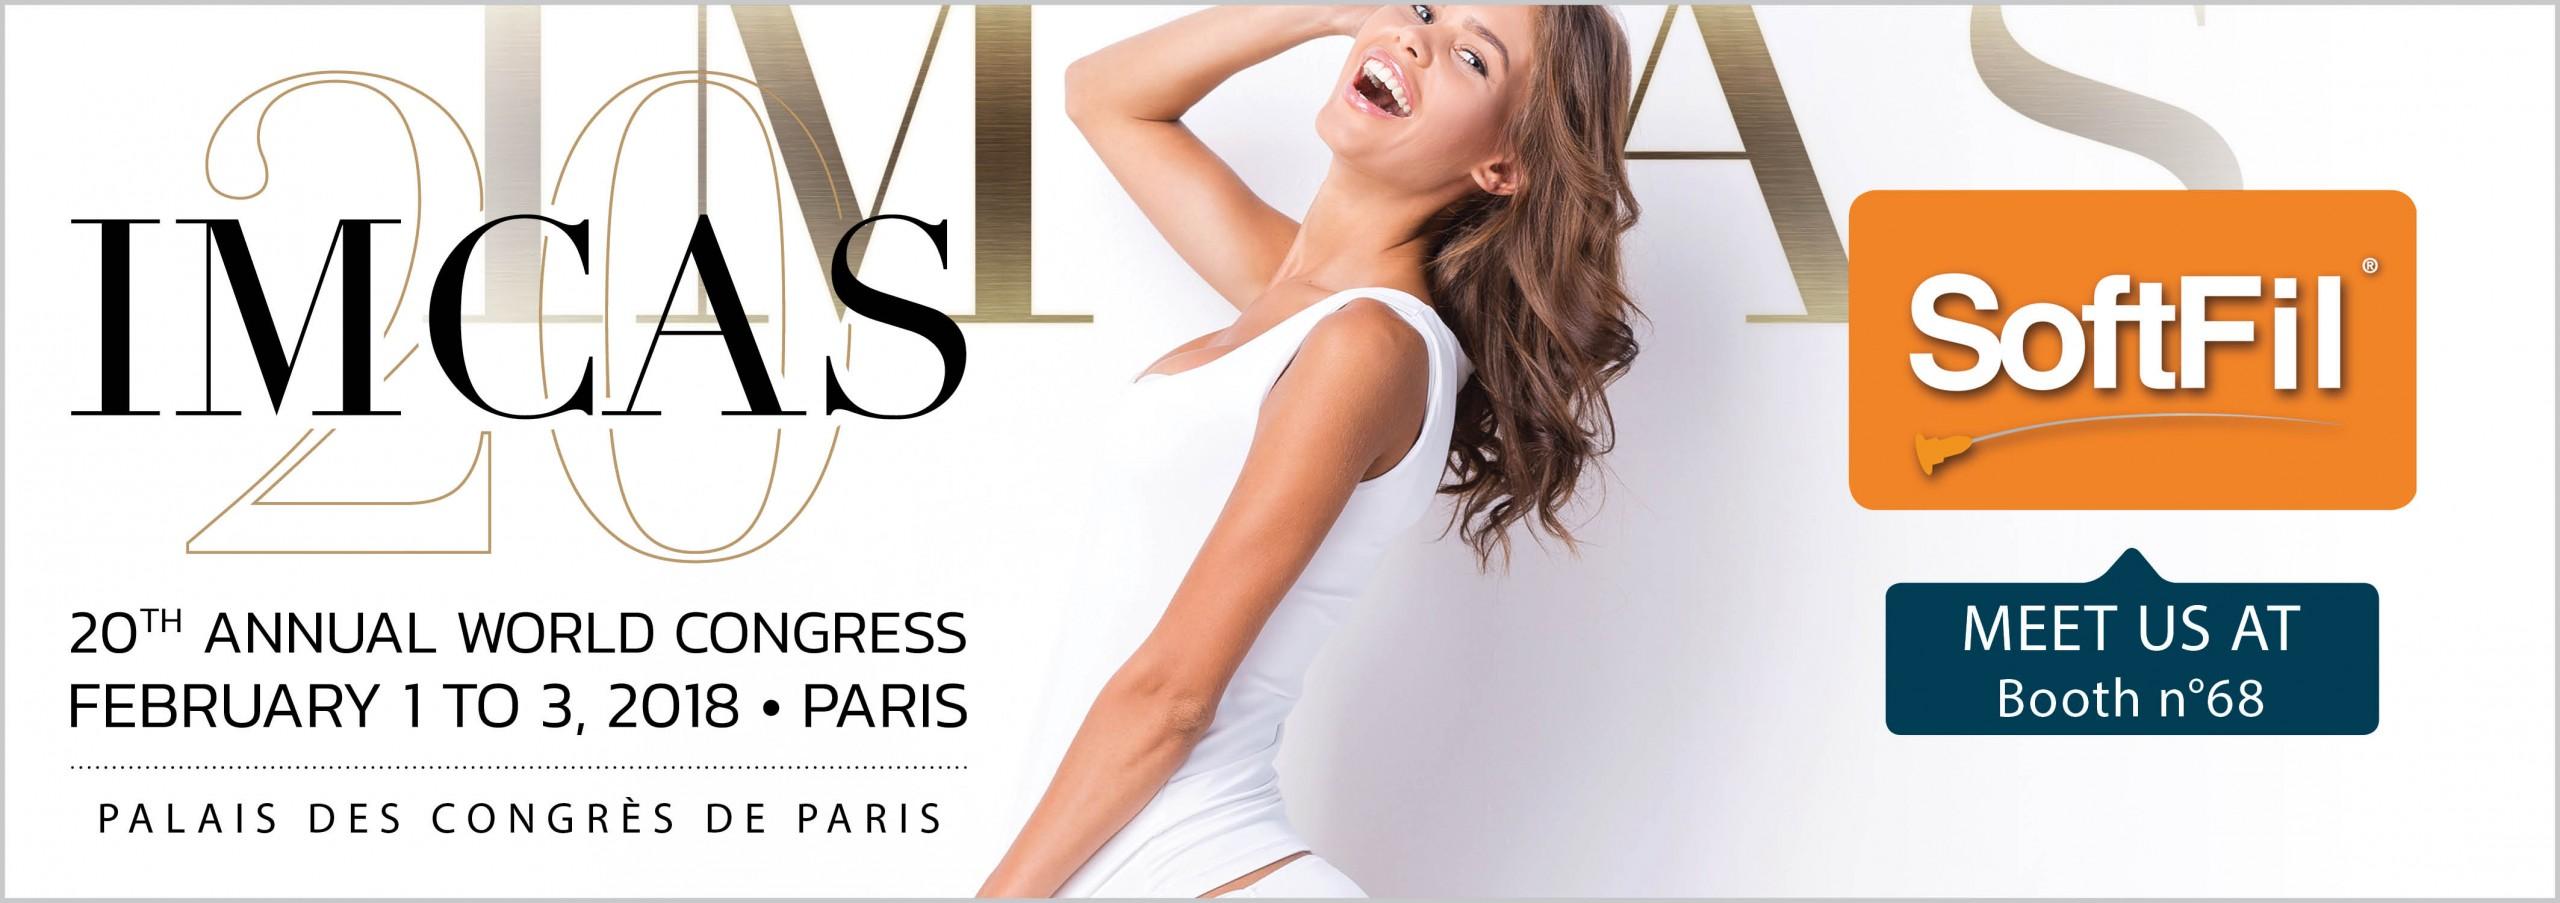 IMCAS 2018 – Paris 20th Edition